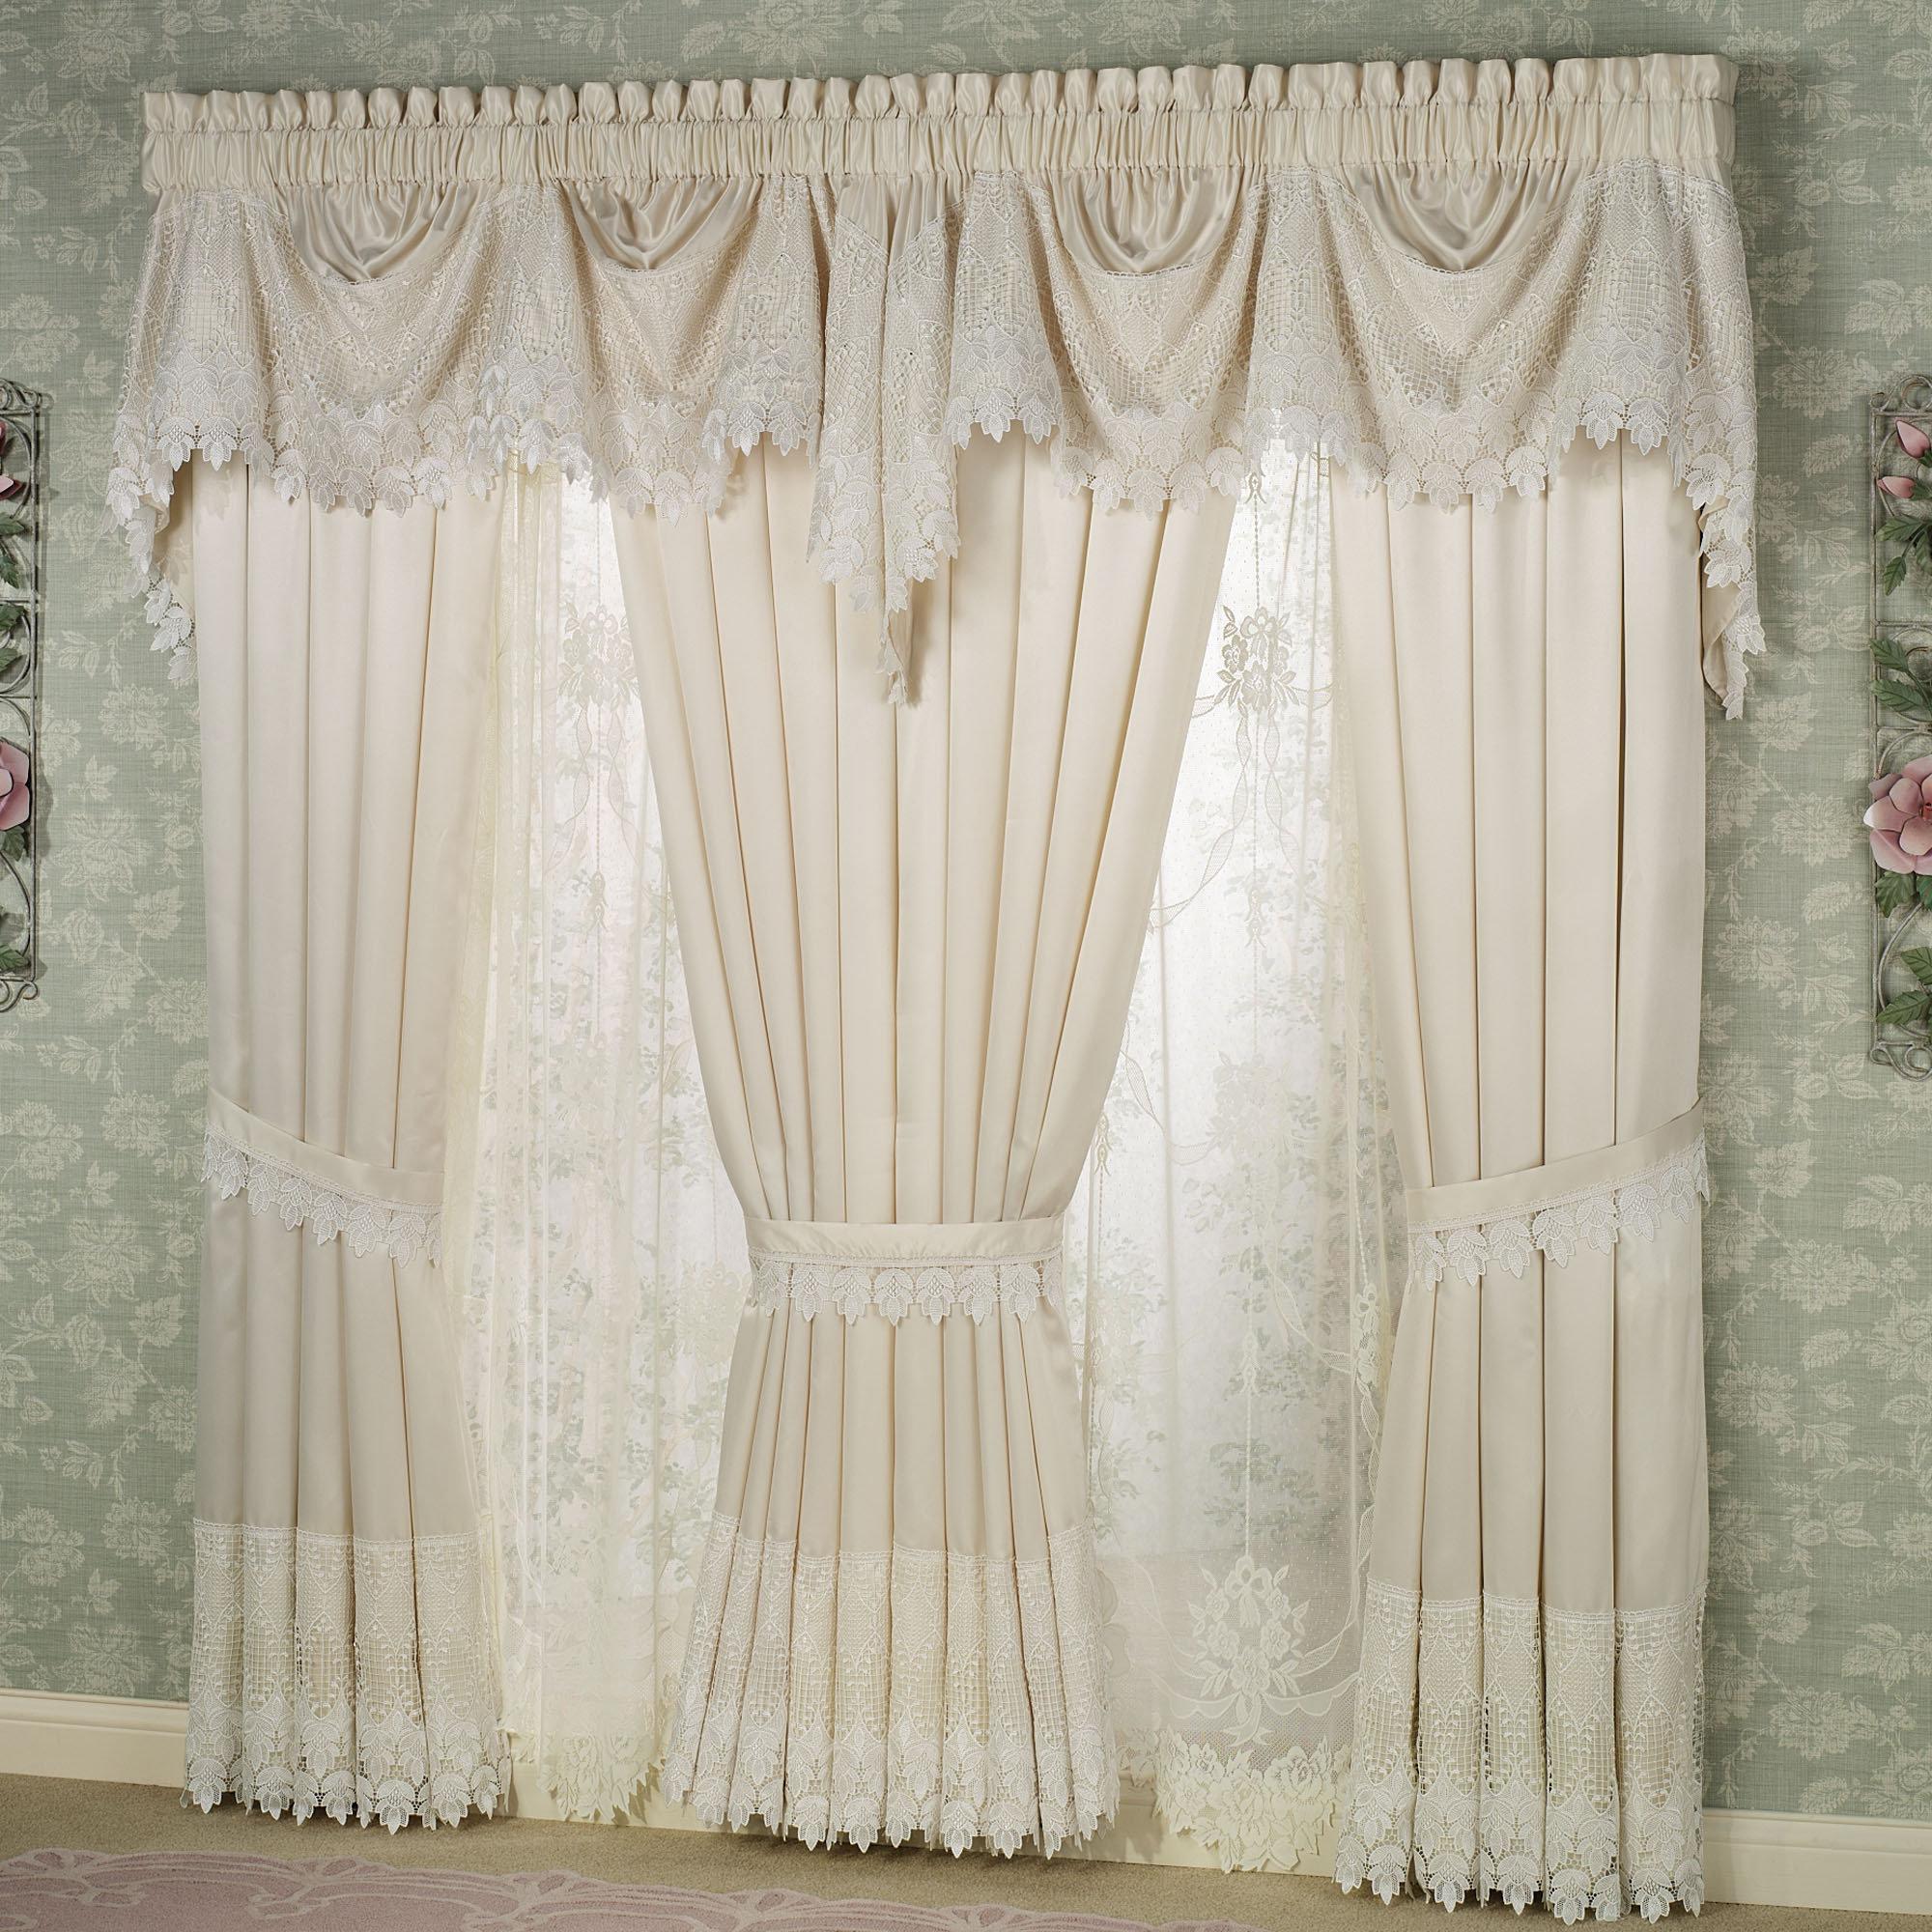 White lace kitchen curtains Photo - 1